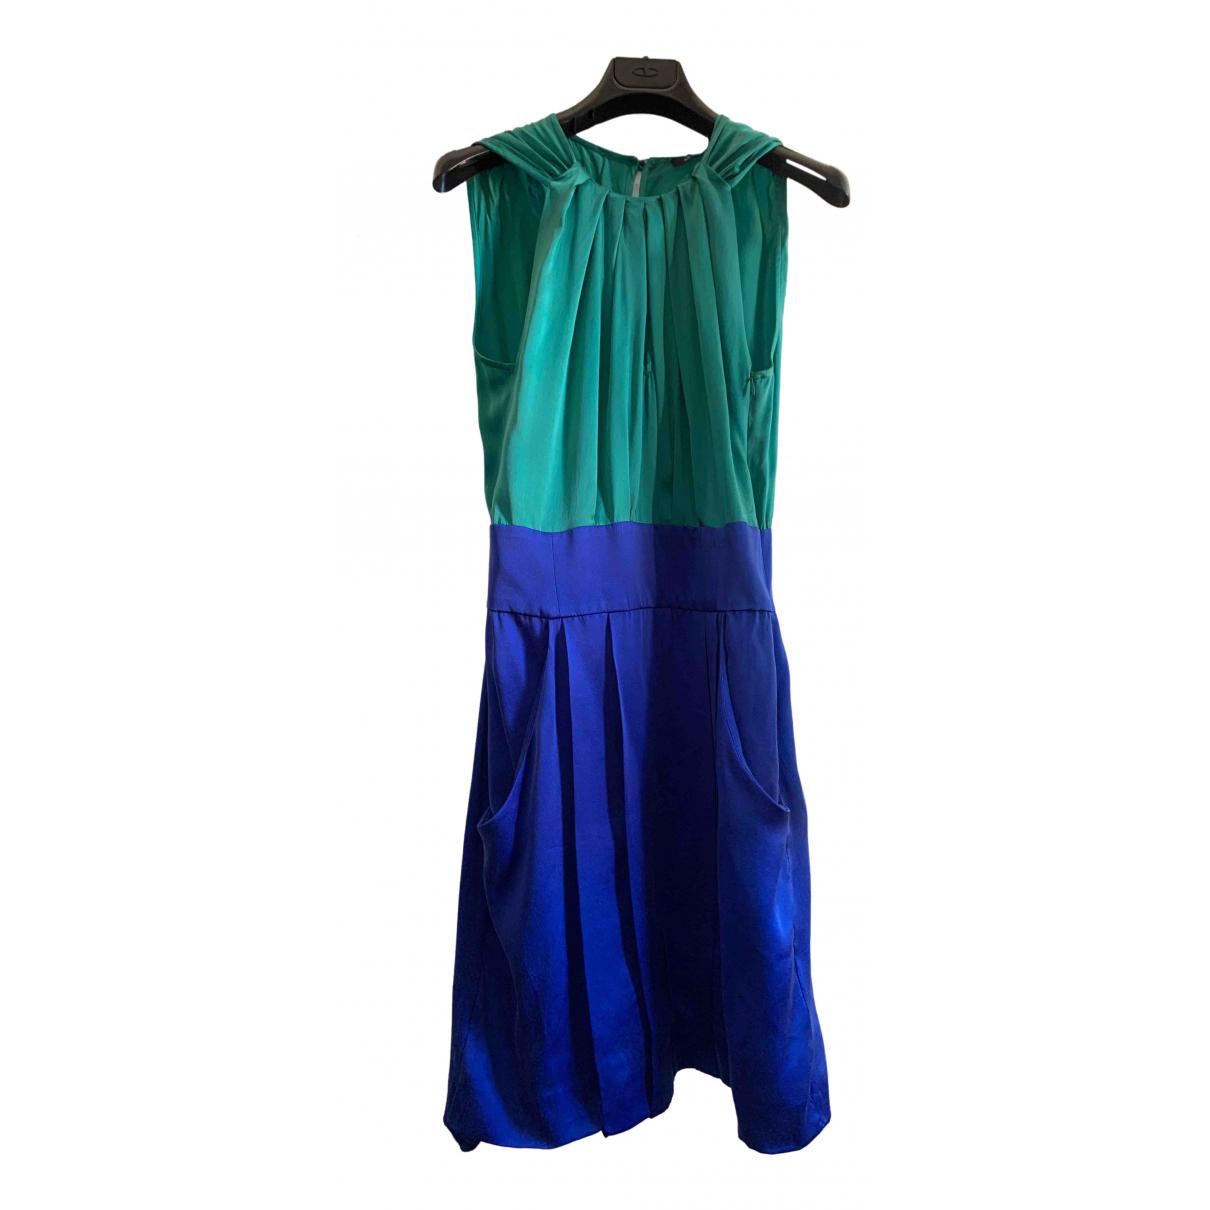 Max & Co \N Green Silk dress for Women 38 IT